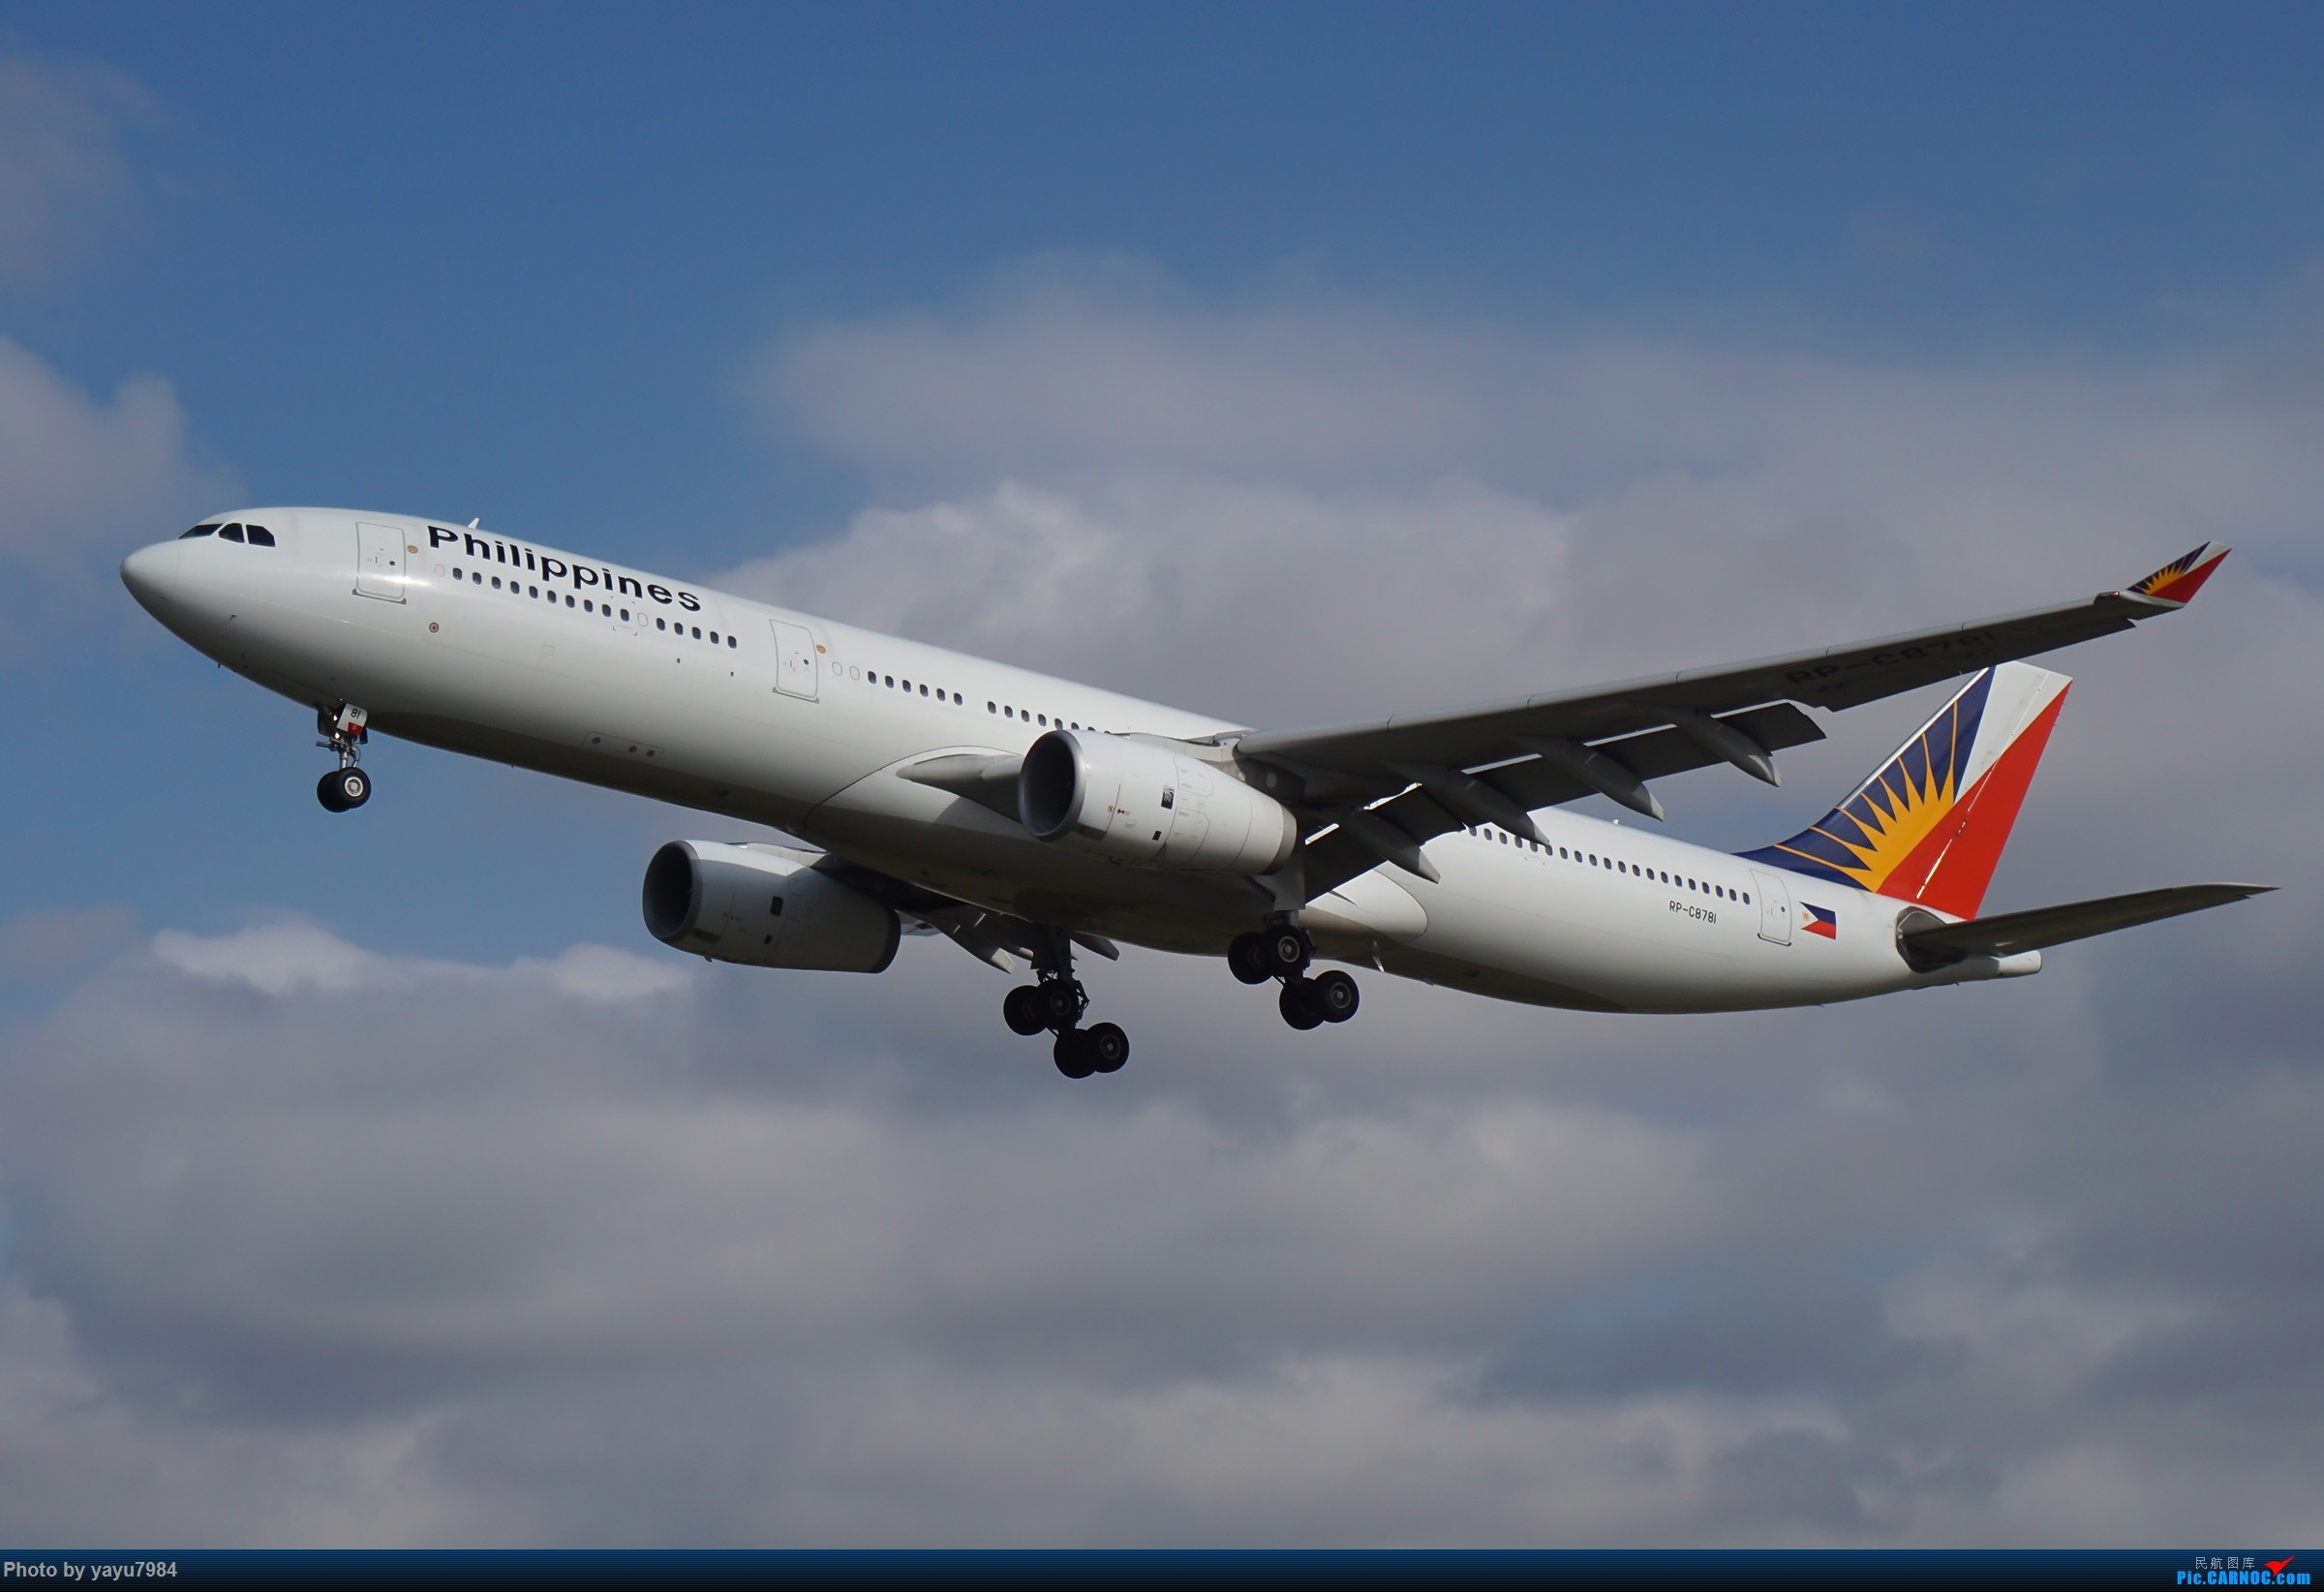 Re:[原创][SYD] 东航天合332,雪绒花343,华航蓝鹊,以及其他日常货 AIRBUS A330-300 RP-C8781 澳大利亚悉尼金斯福德·史密斯机场